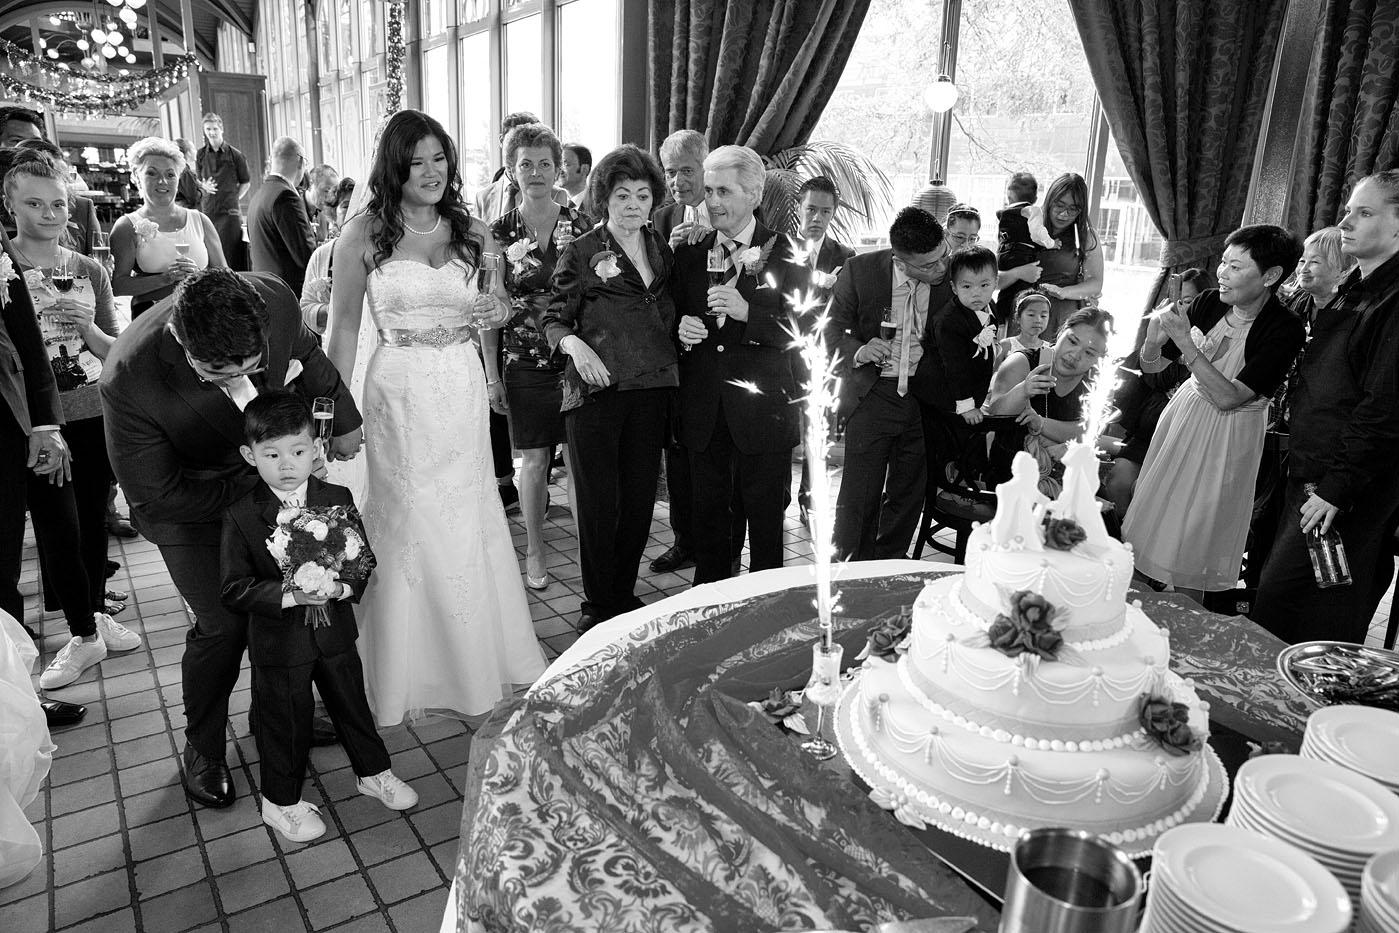 bruiloft-wedding-trouwen-fotograaf-chinees-bobhersbach-rotterdam-taart